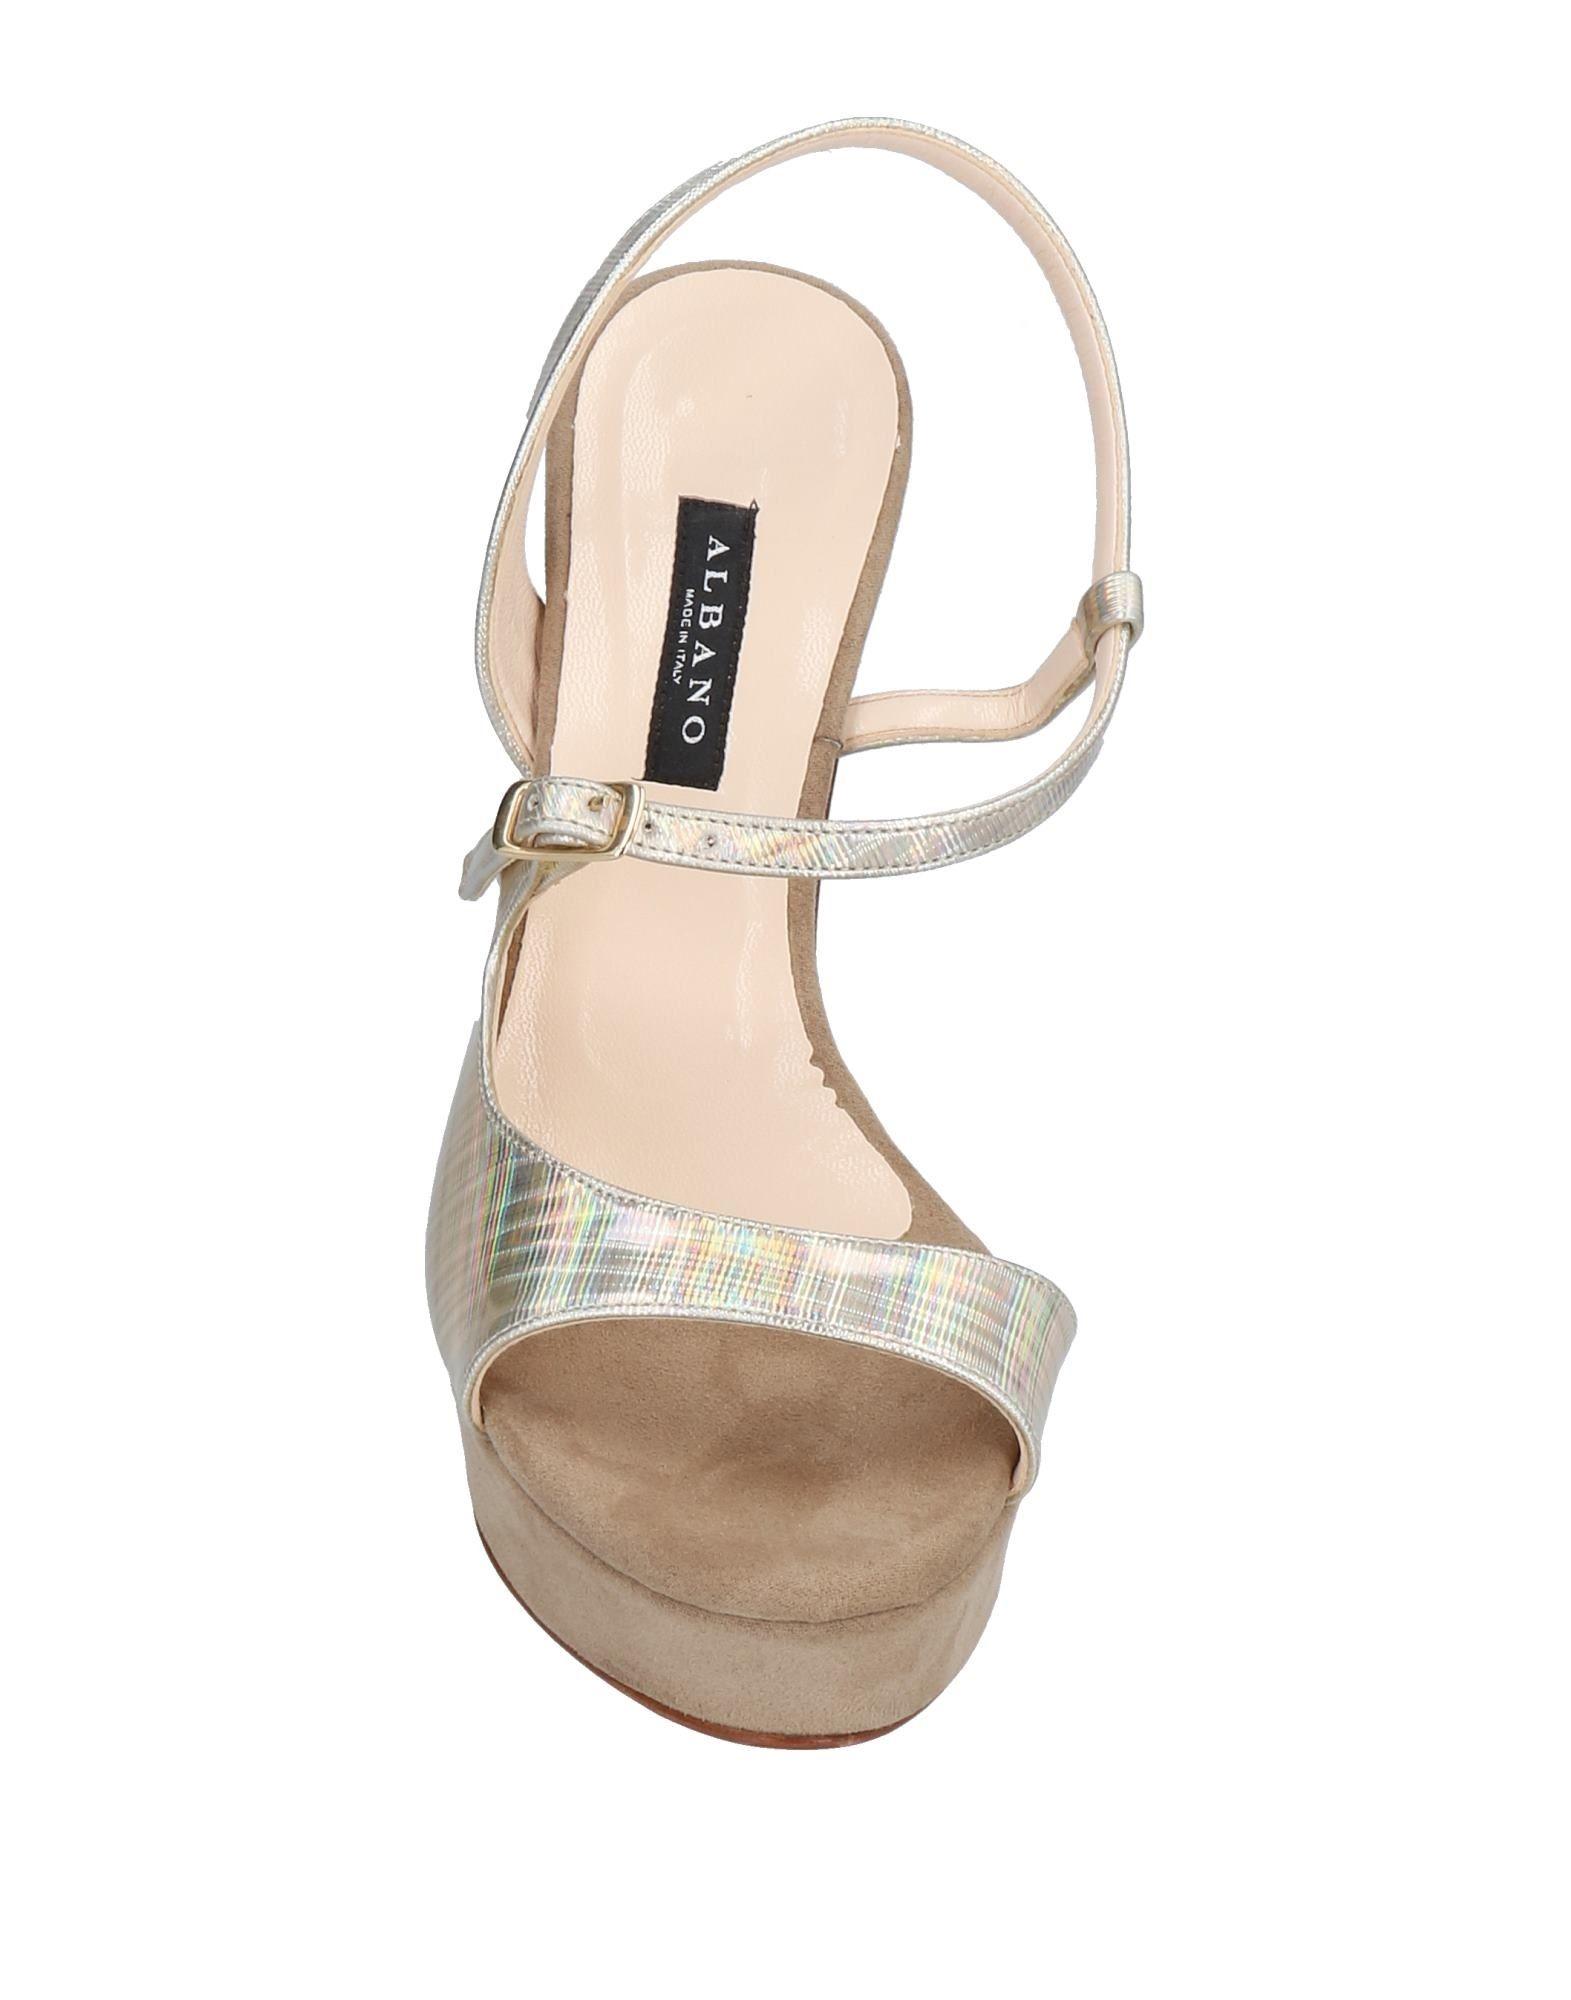 Albano Albano Albano Sandalen Damen  11492063AT Gute Qualität beliebte Schuhe 47da73